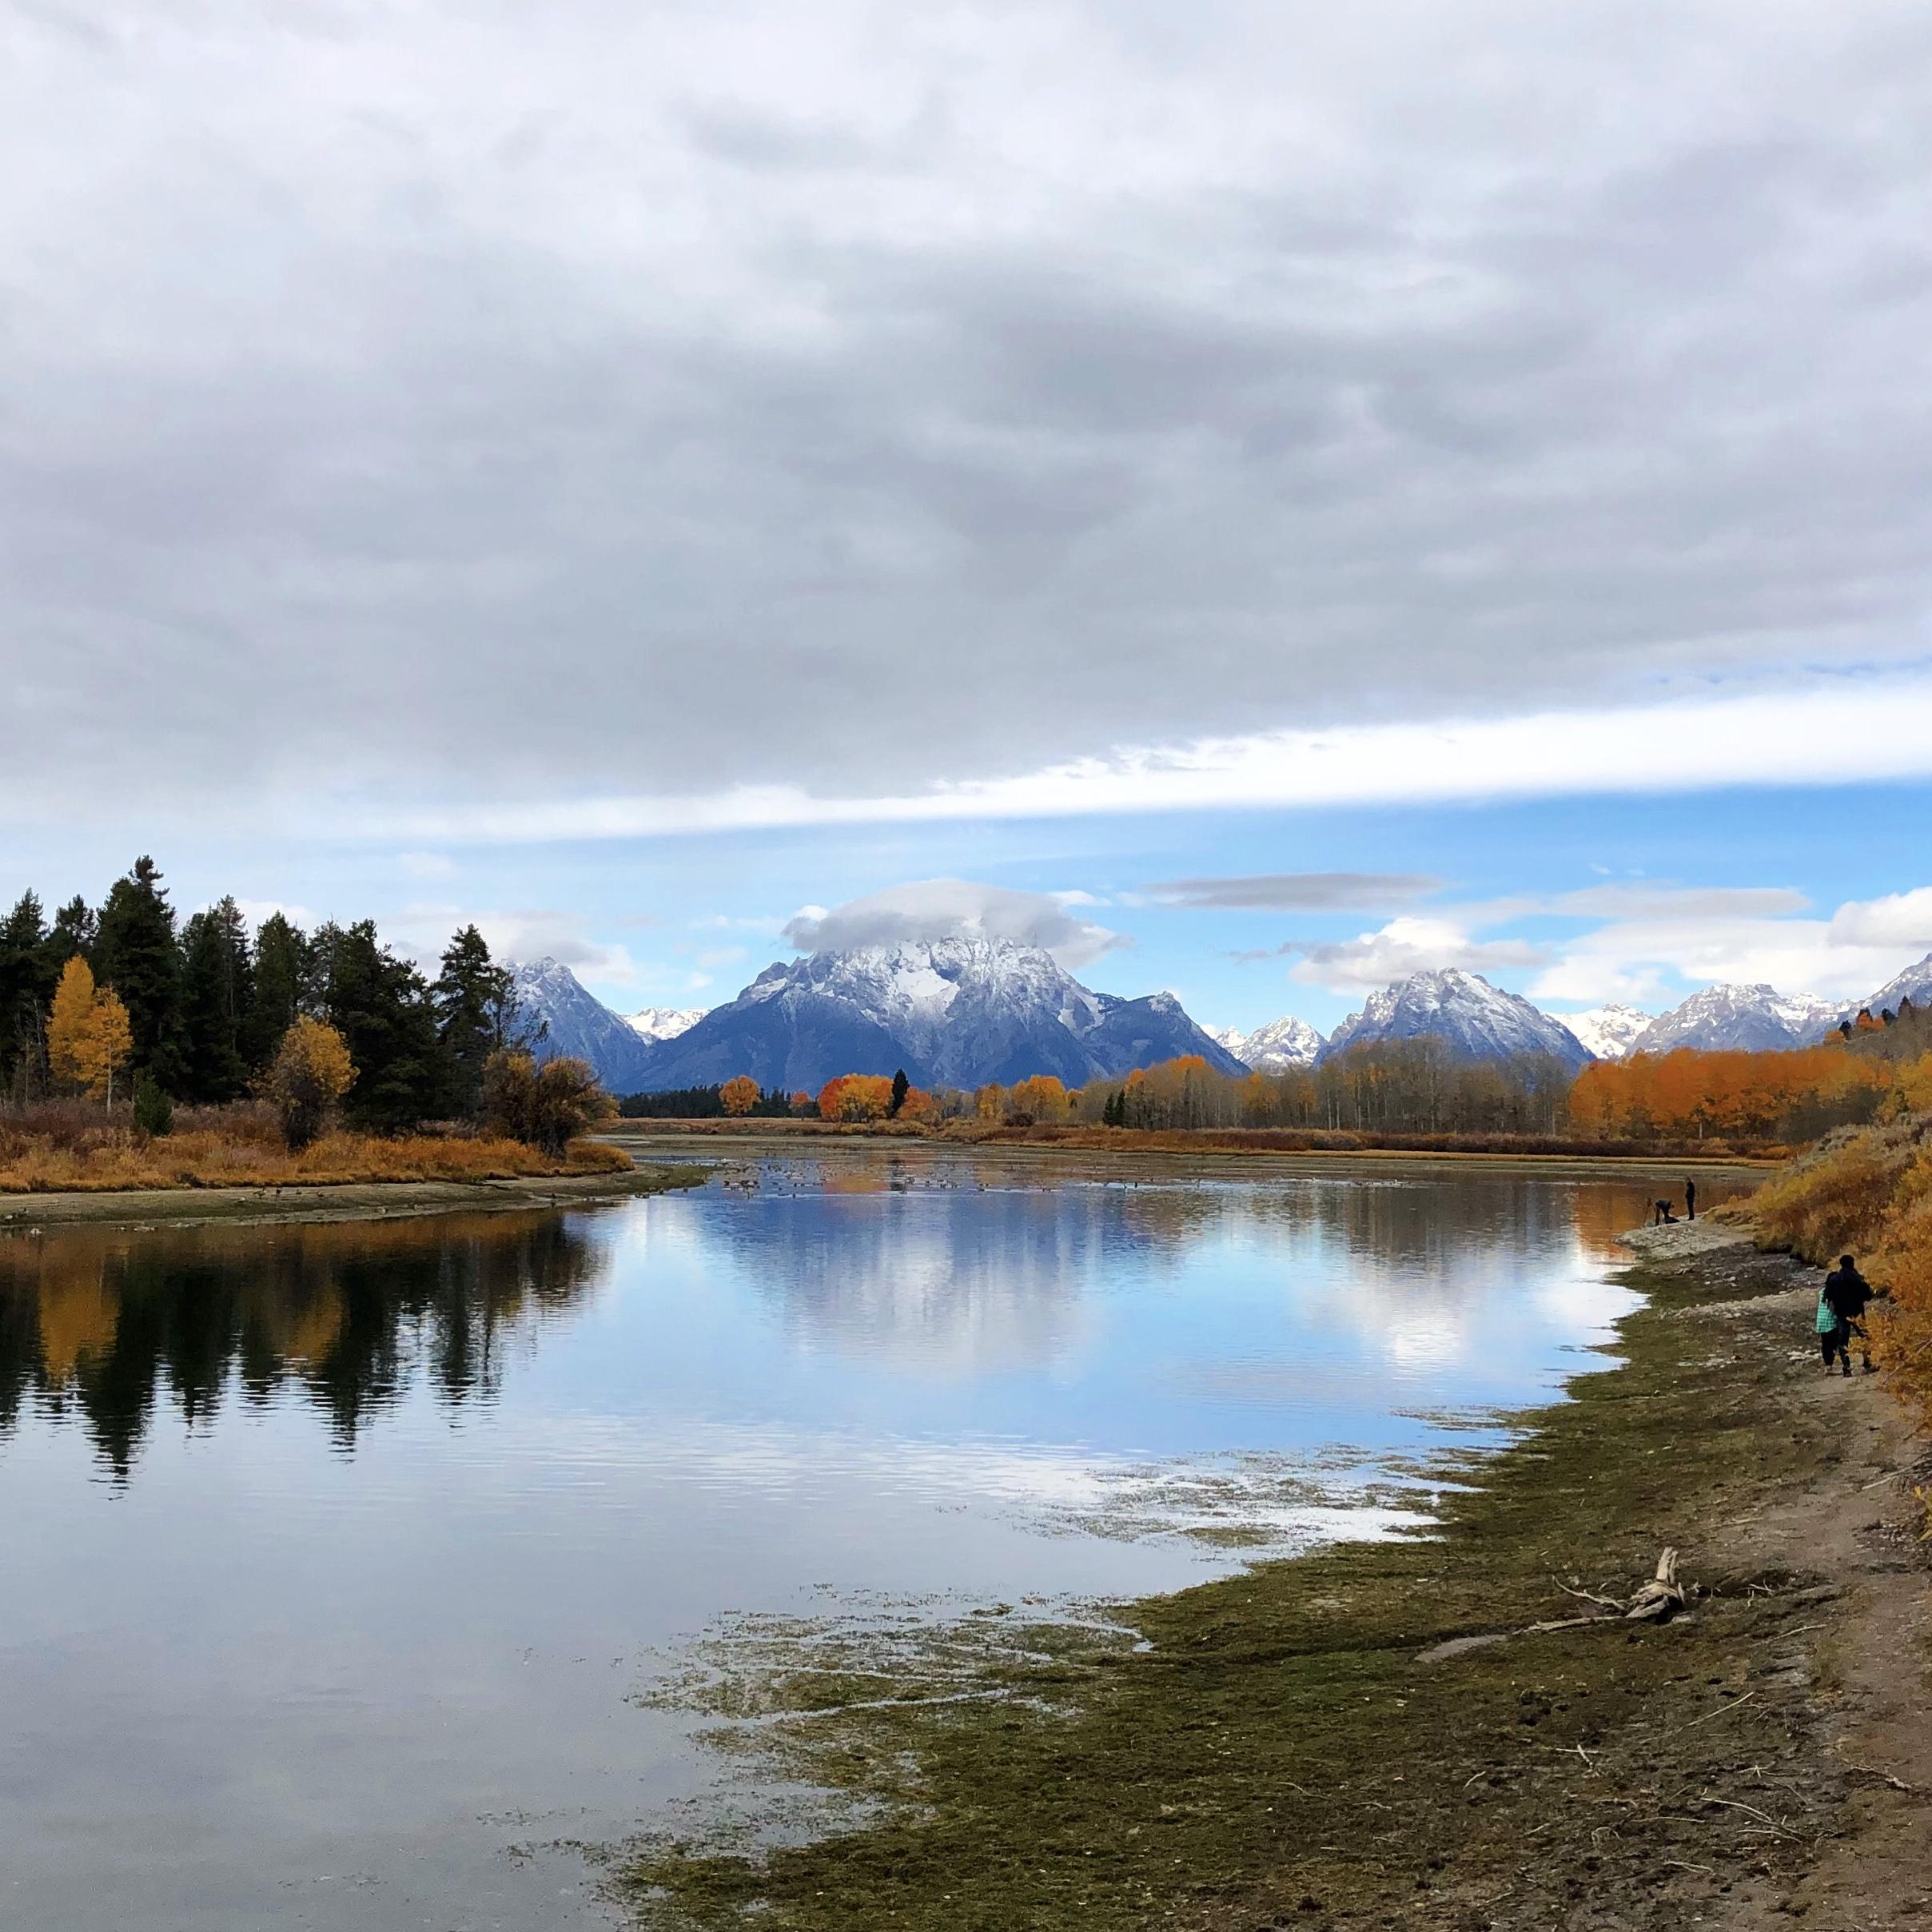 Teton National Park, Wyoming